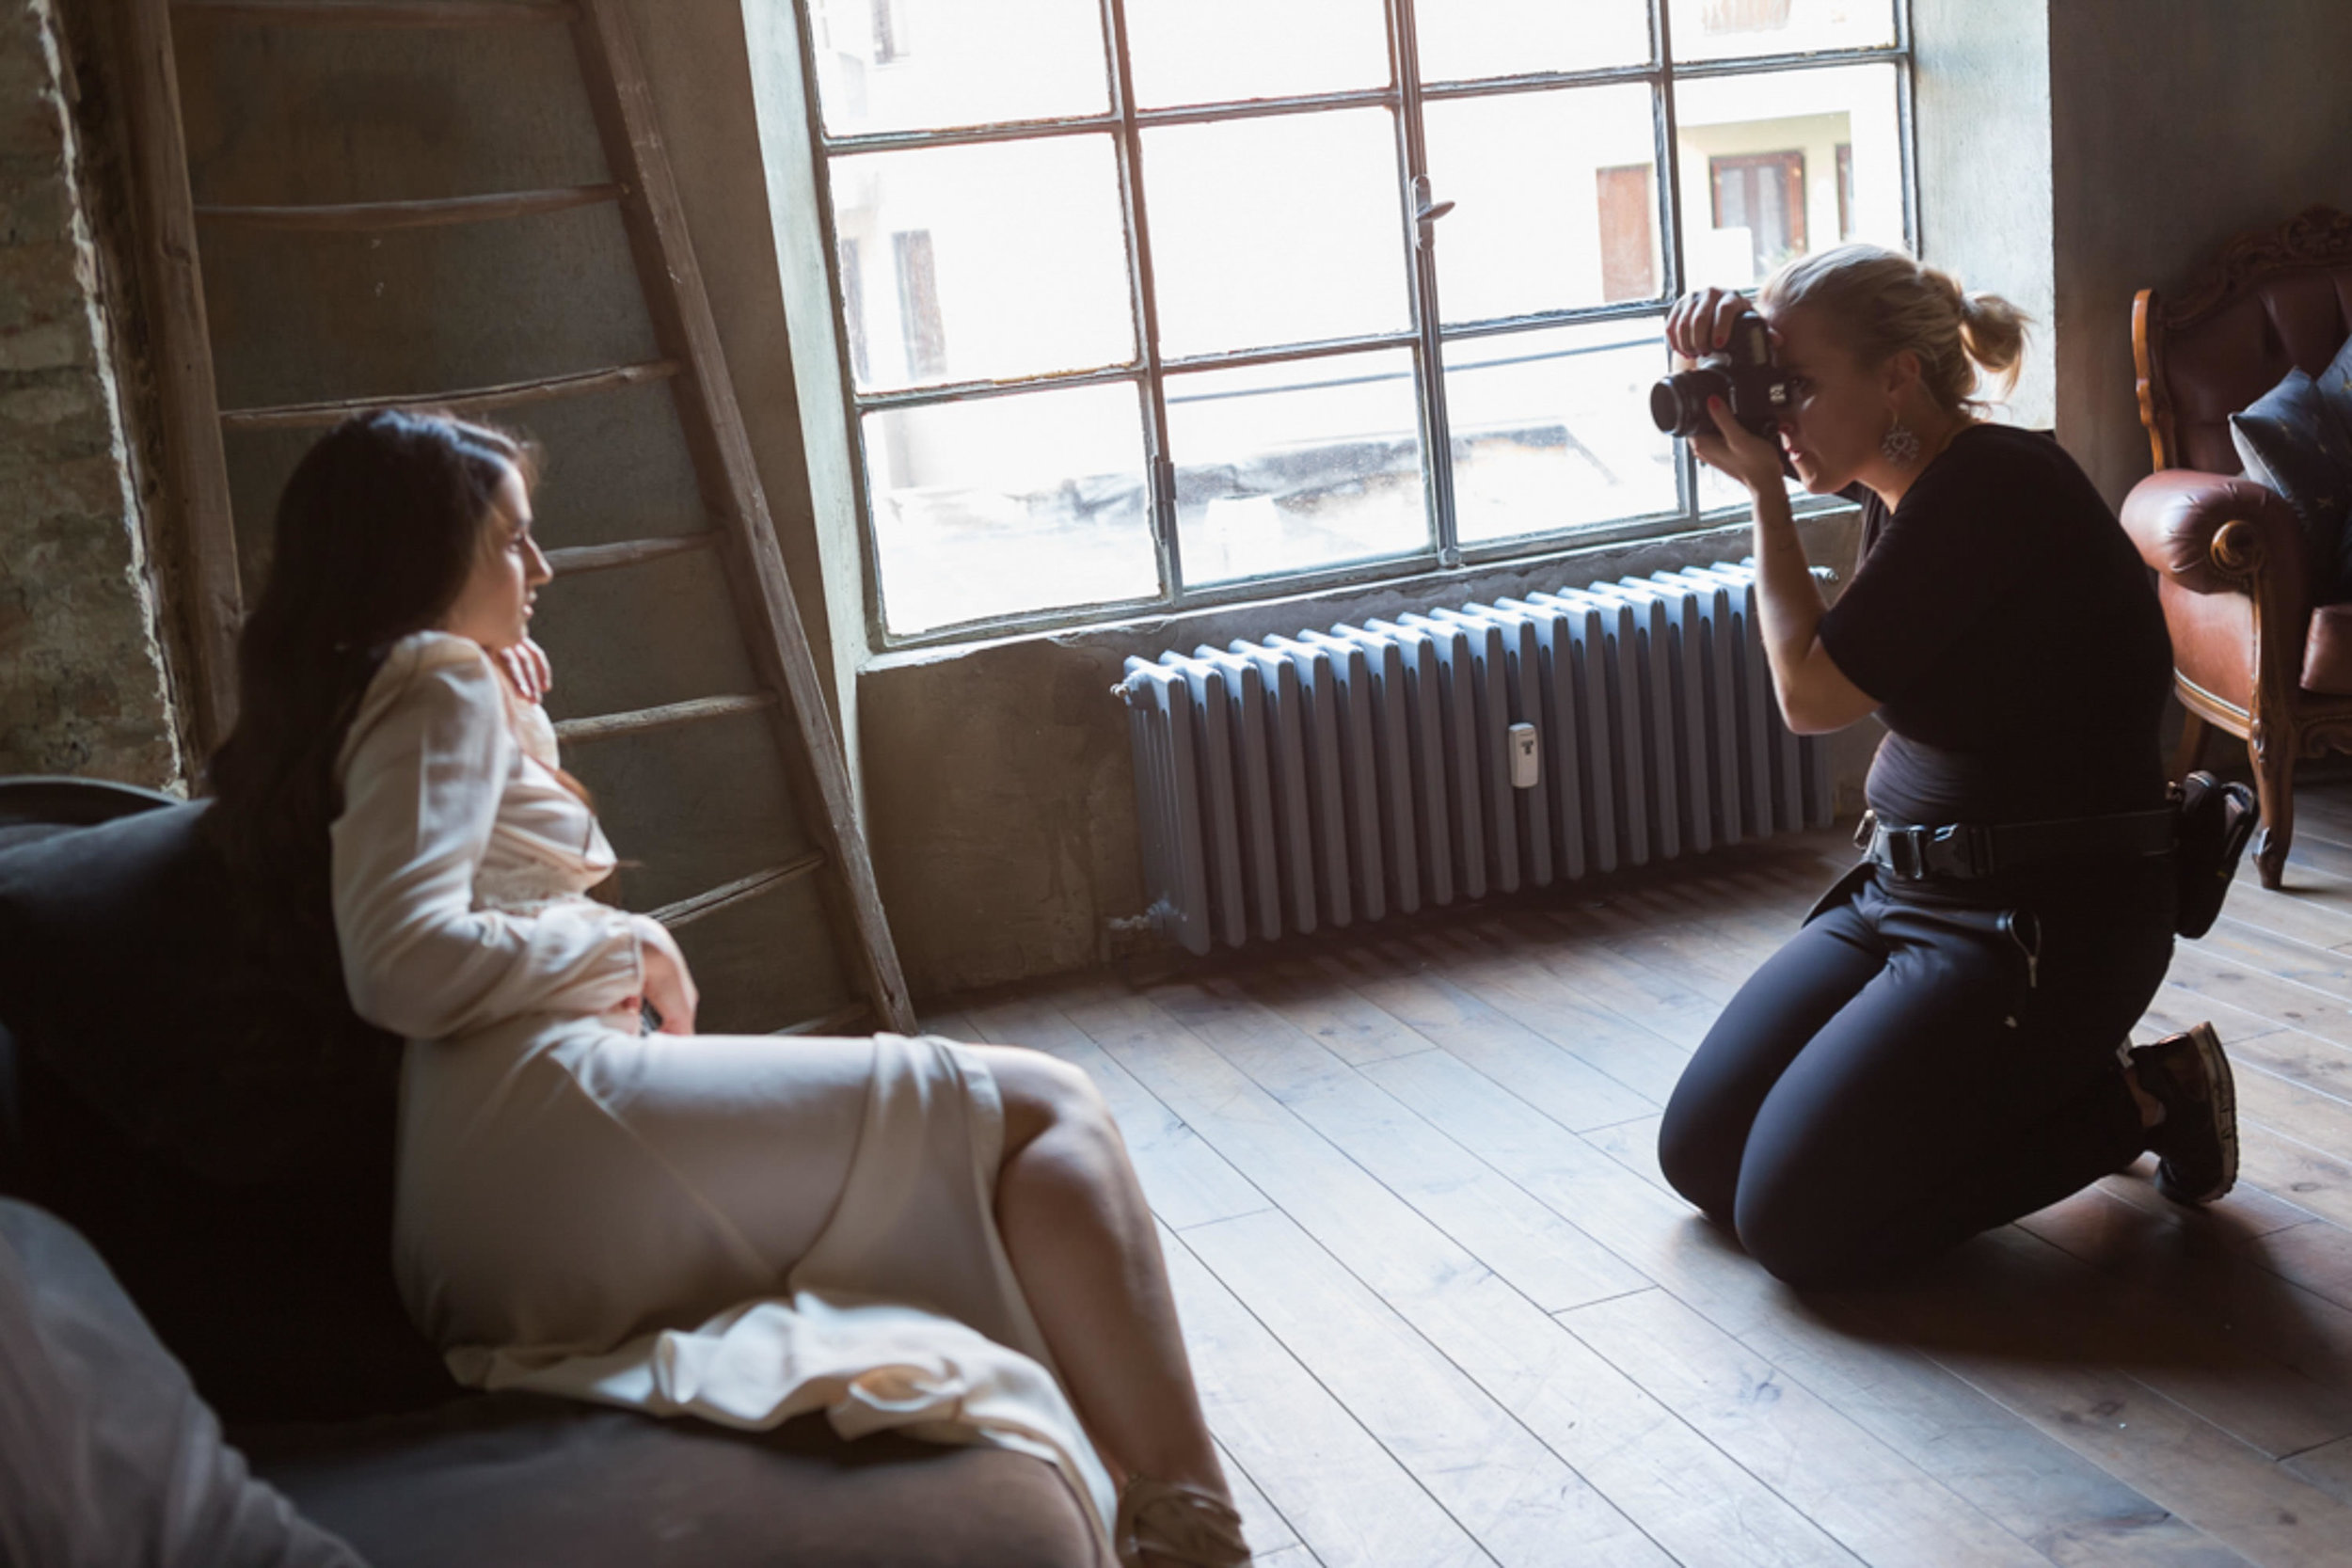 boudoir fotograaf Nederland zwolle training workshop fotograaf sensueel empowerment